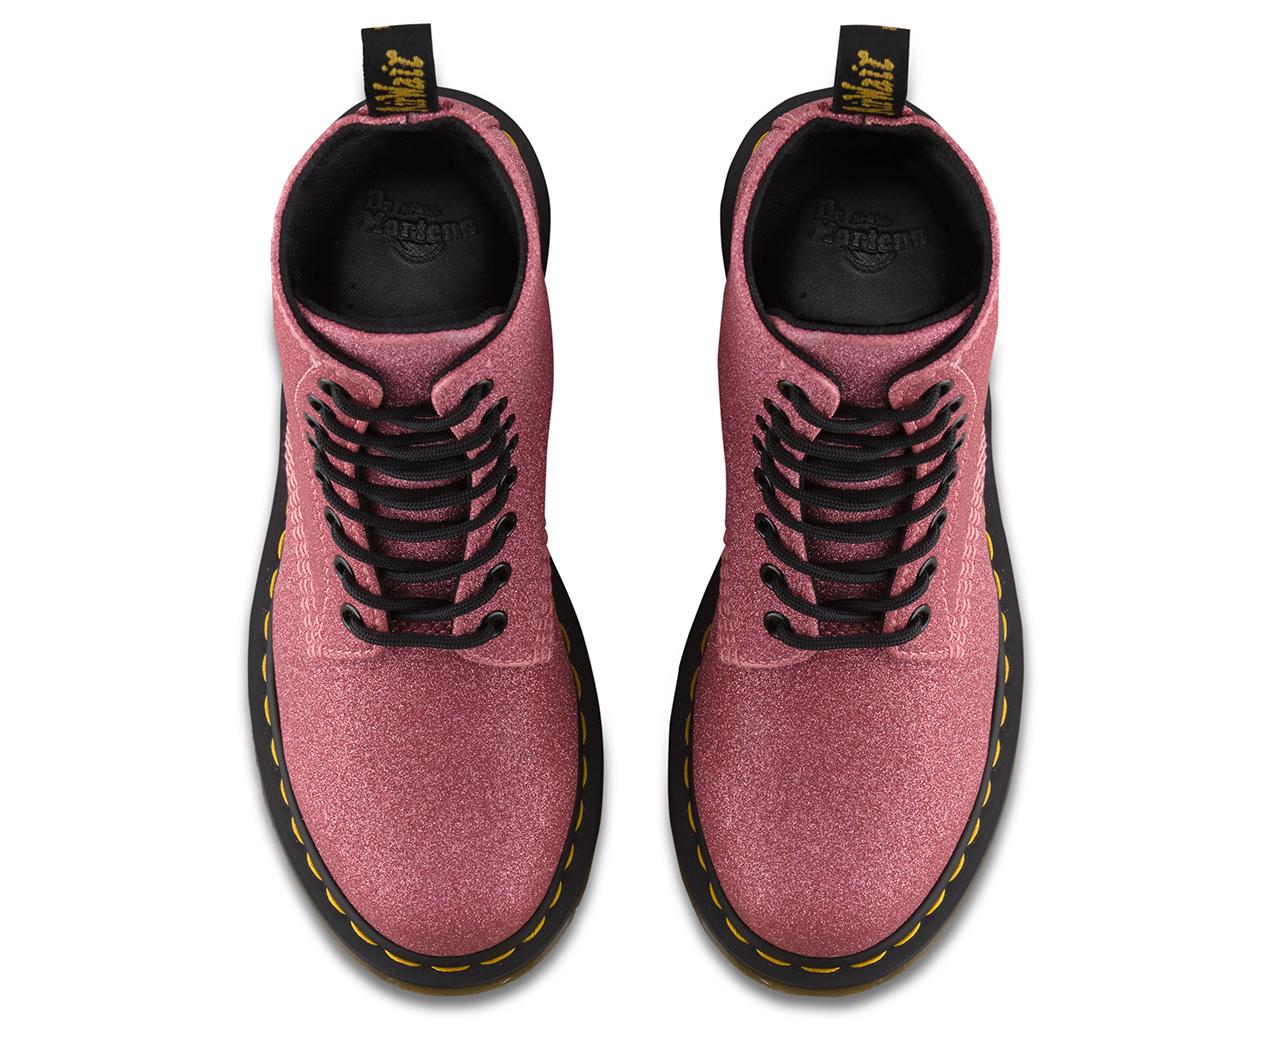 fd07281002a2 1460 PASCAL FINE GLITTER | Women's Boots & Shoes | Canada